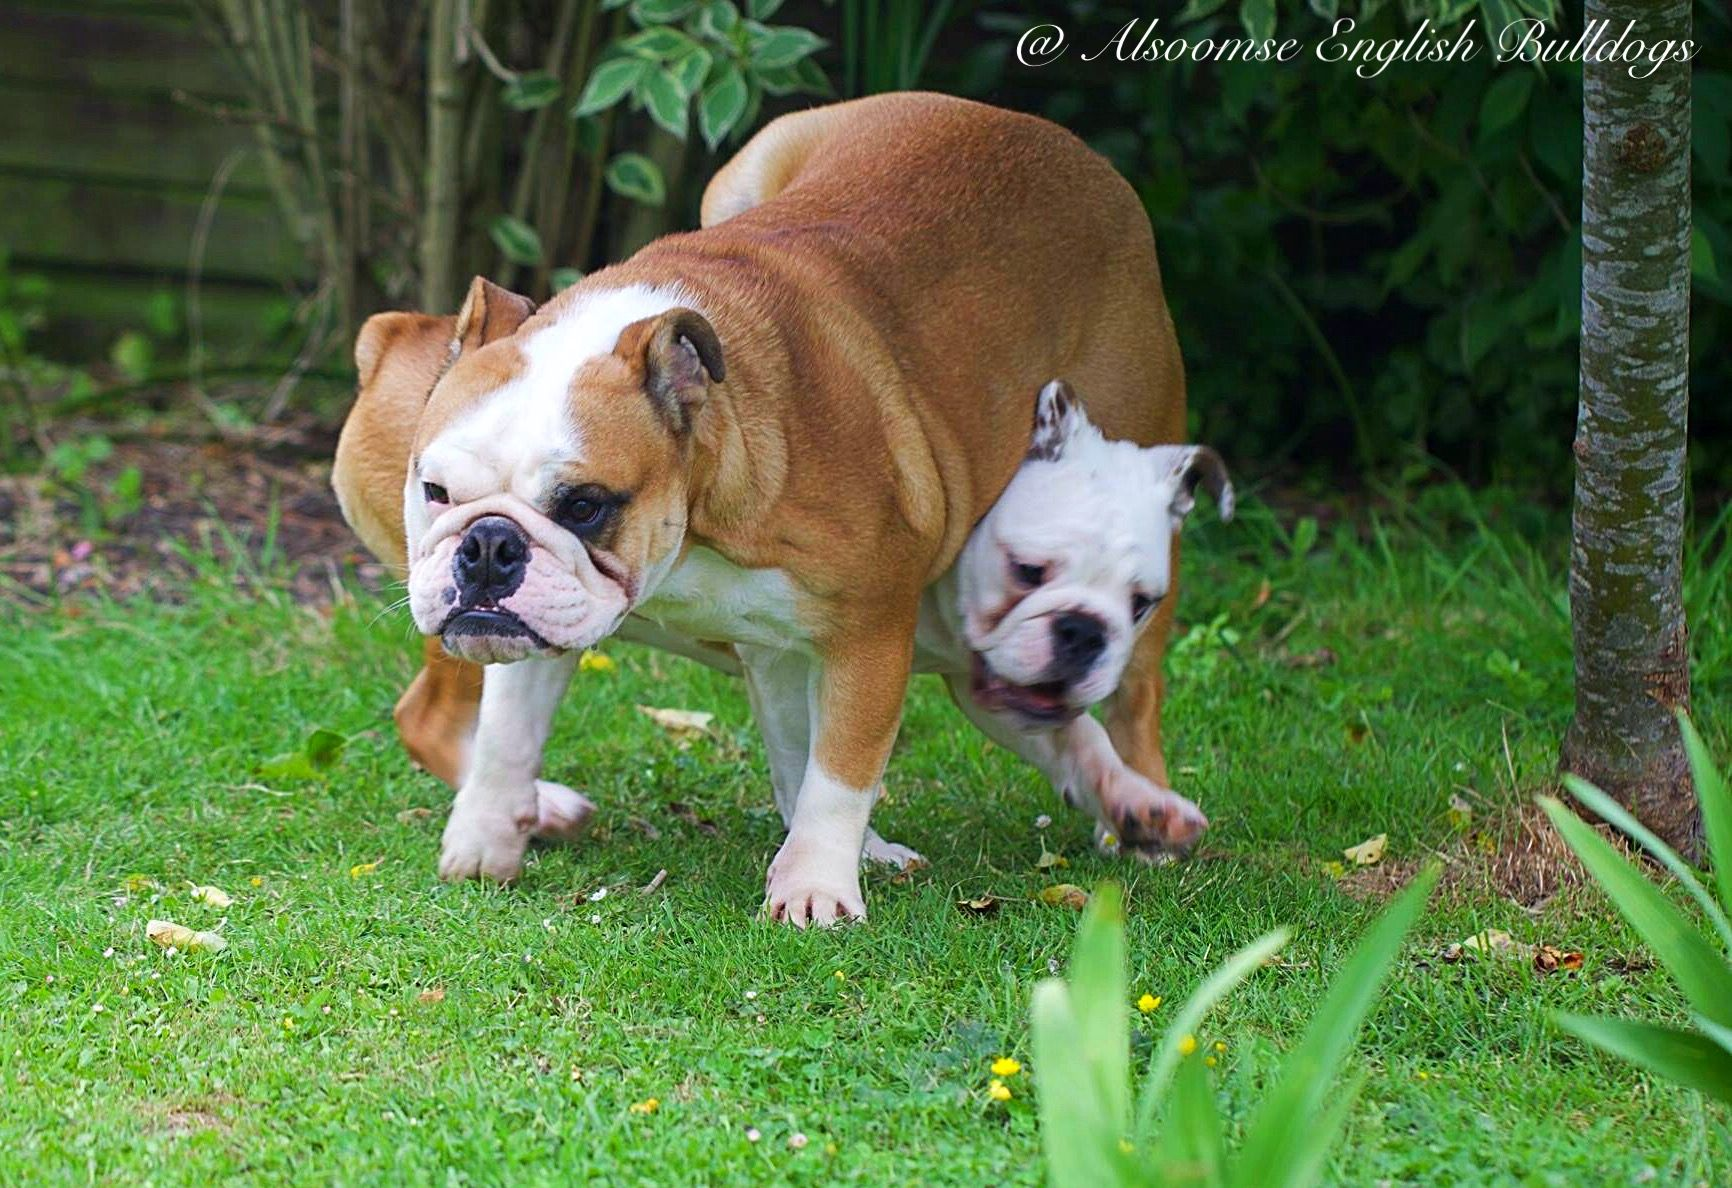 Alsoomse English Bulldogs Bulldog English Bulldog Dogs And Puppies